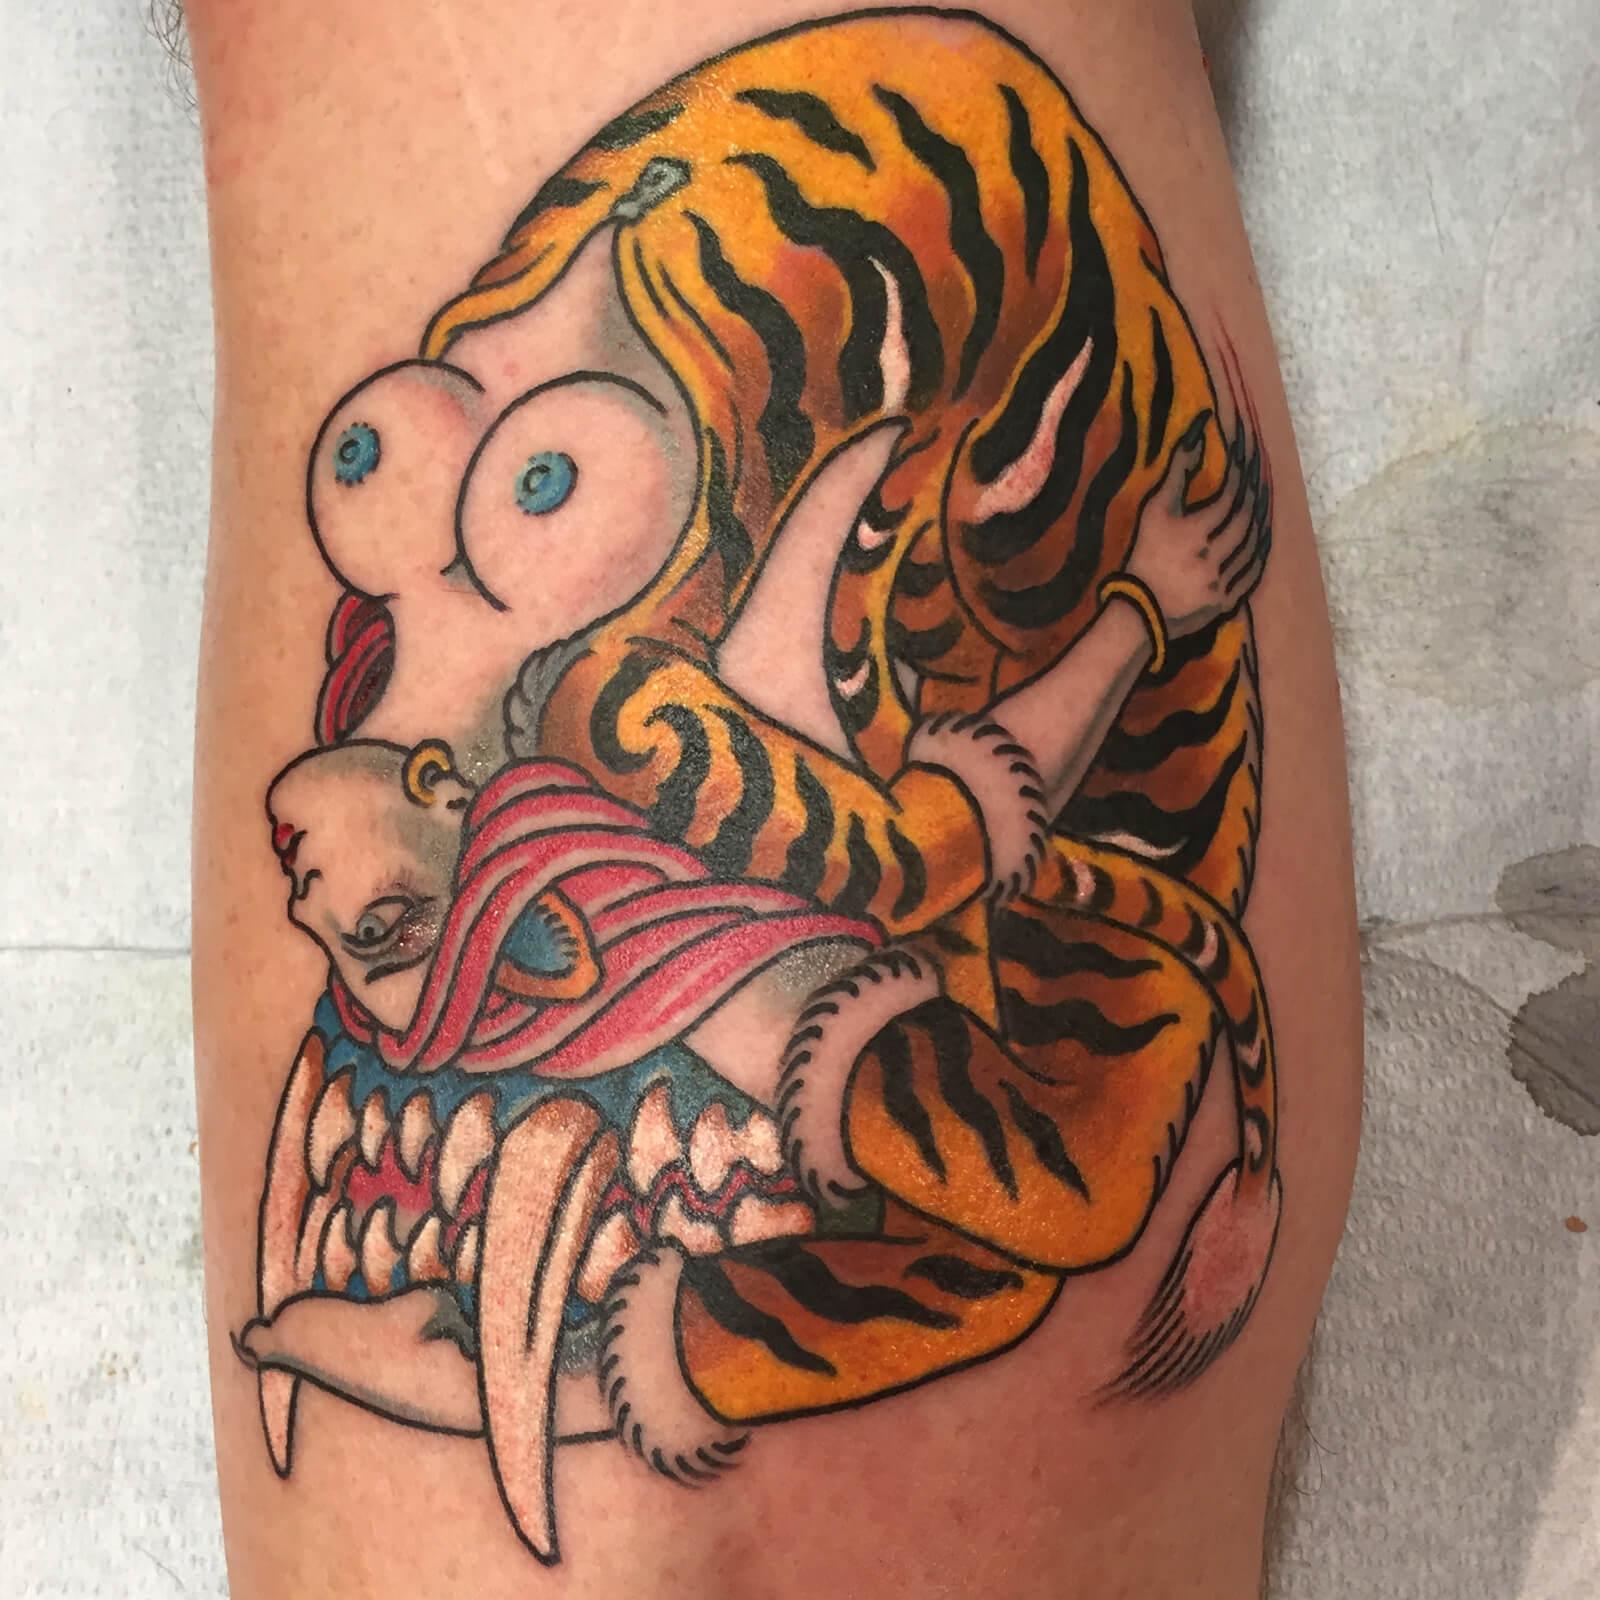 Lango-Oliveira-black-heart-tattoo-8